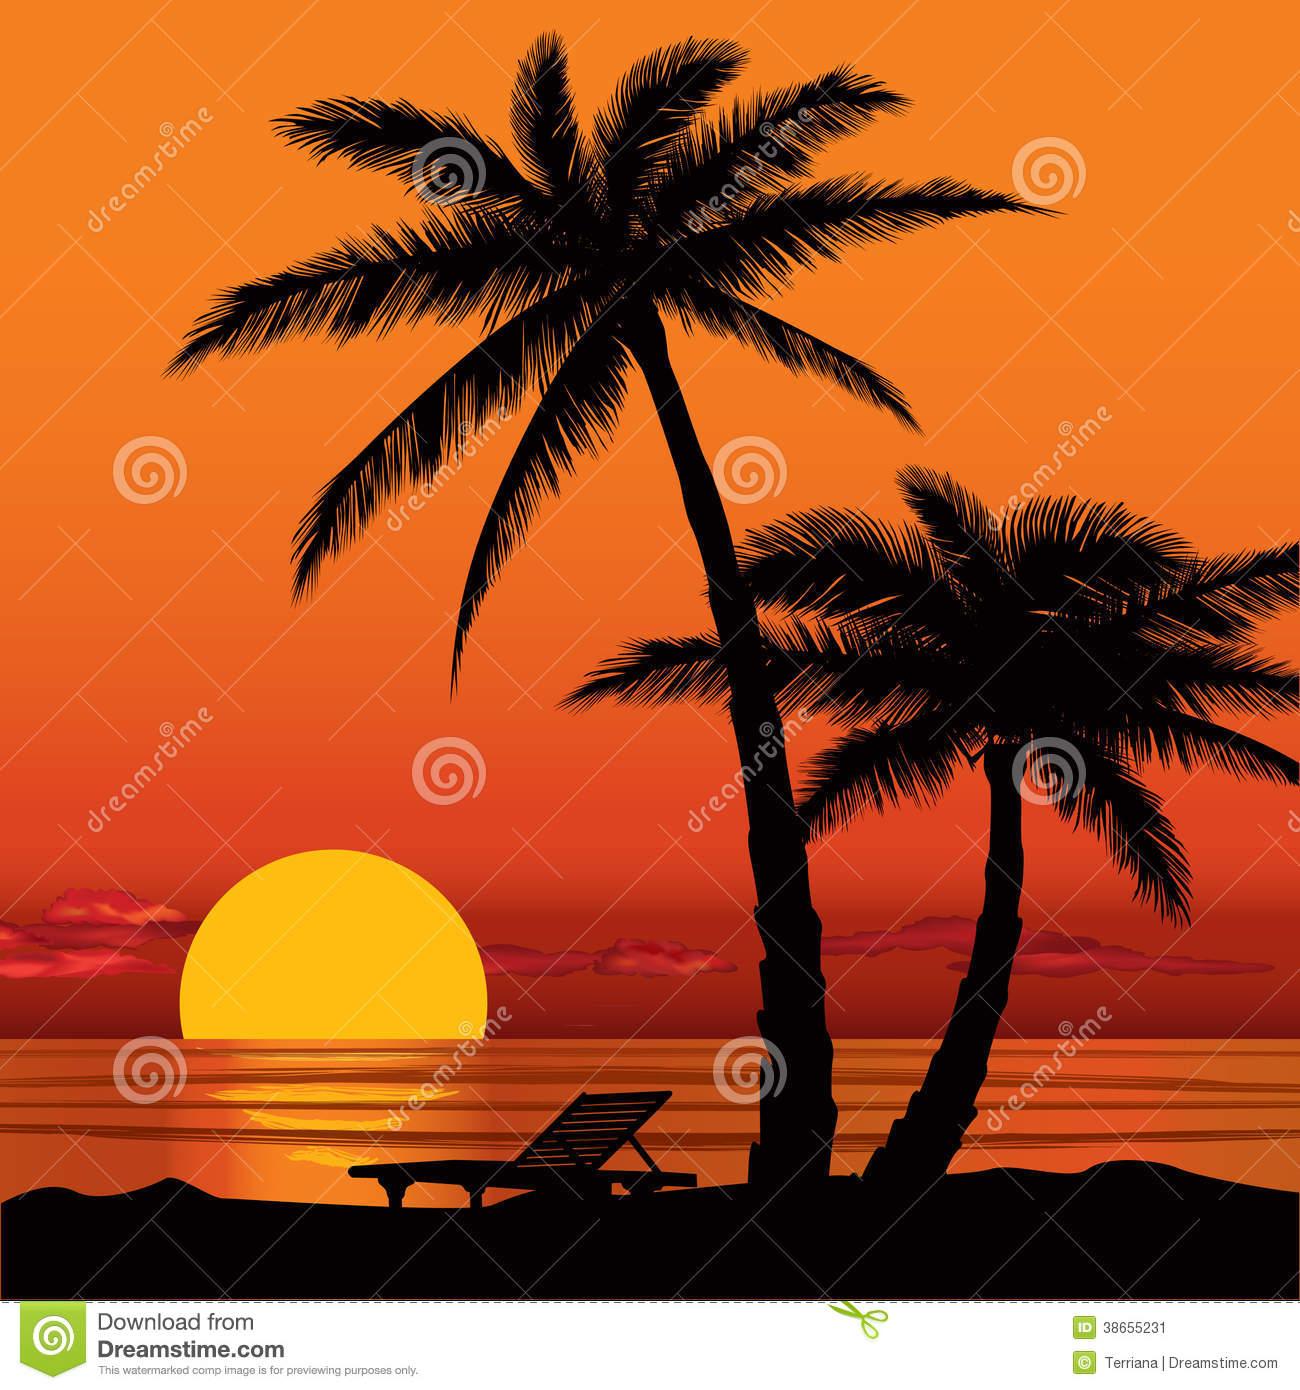 Beach clipart sunset. Silhouette